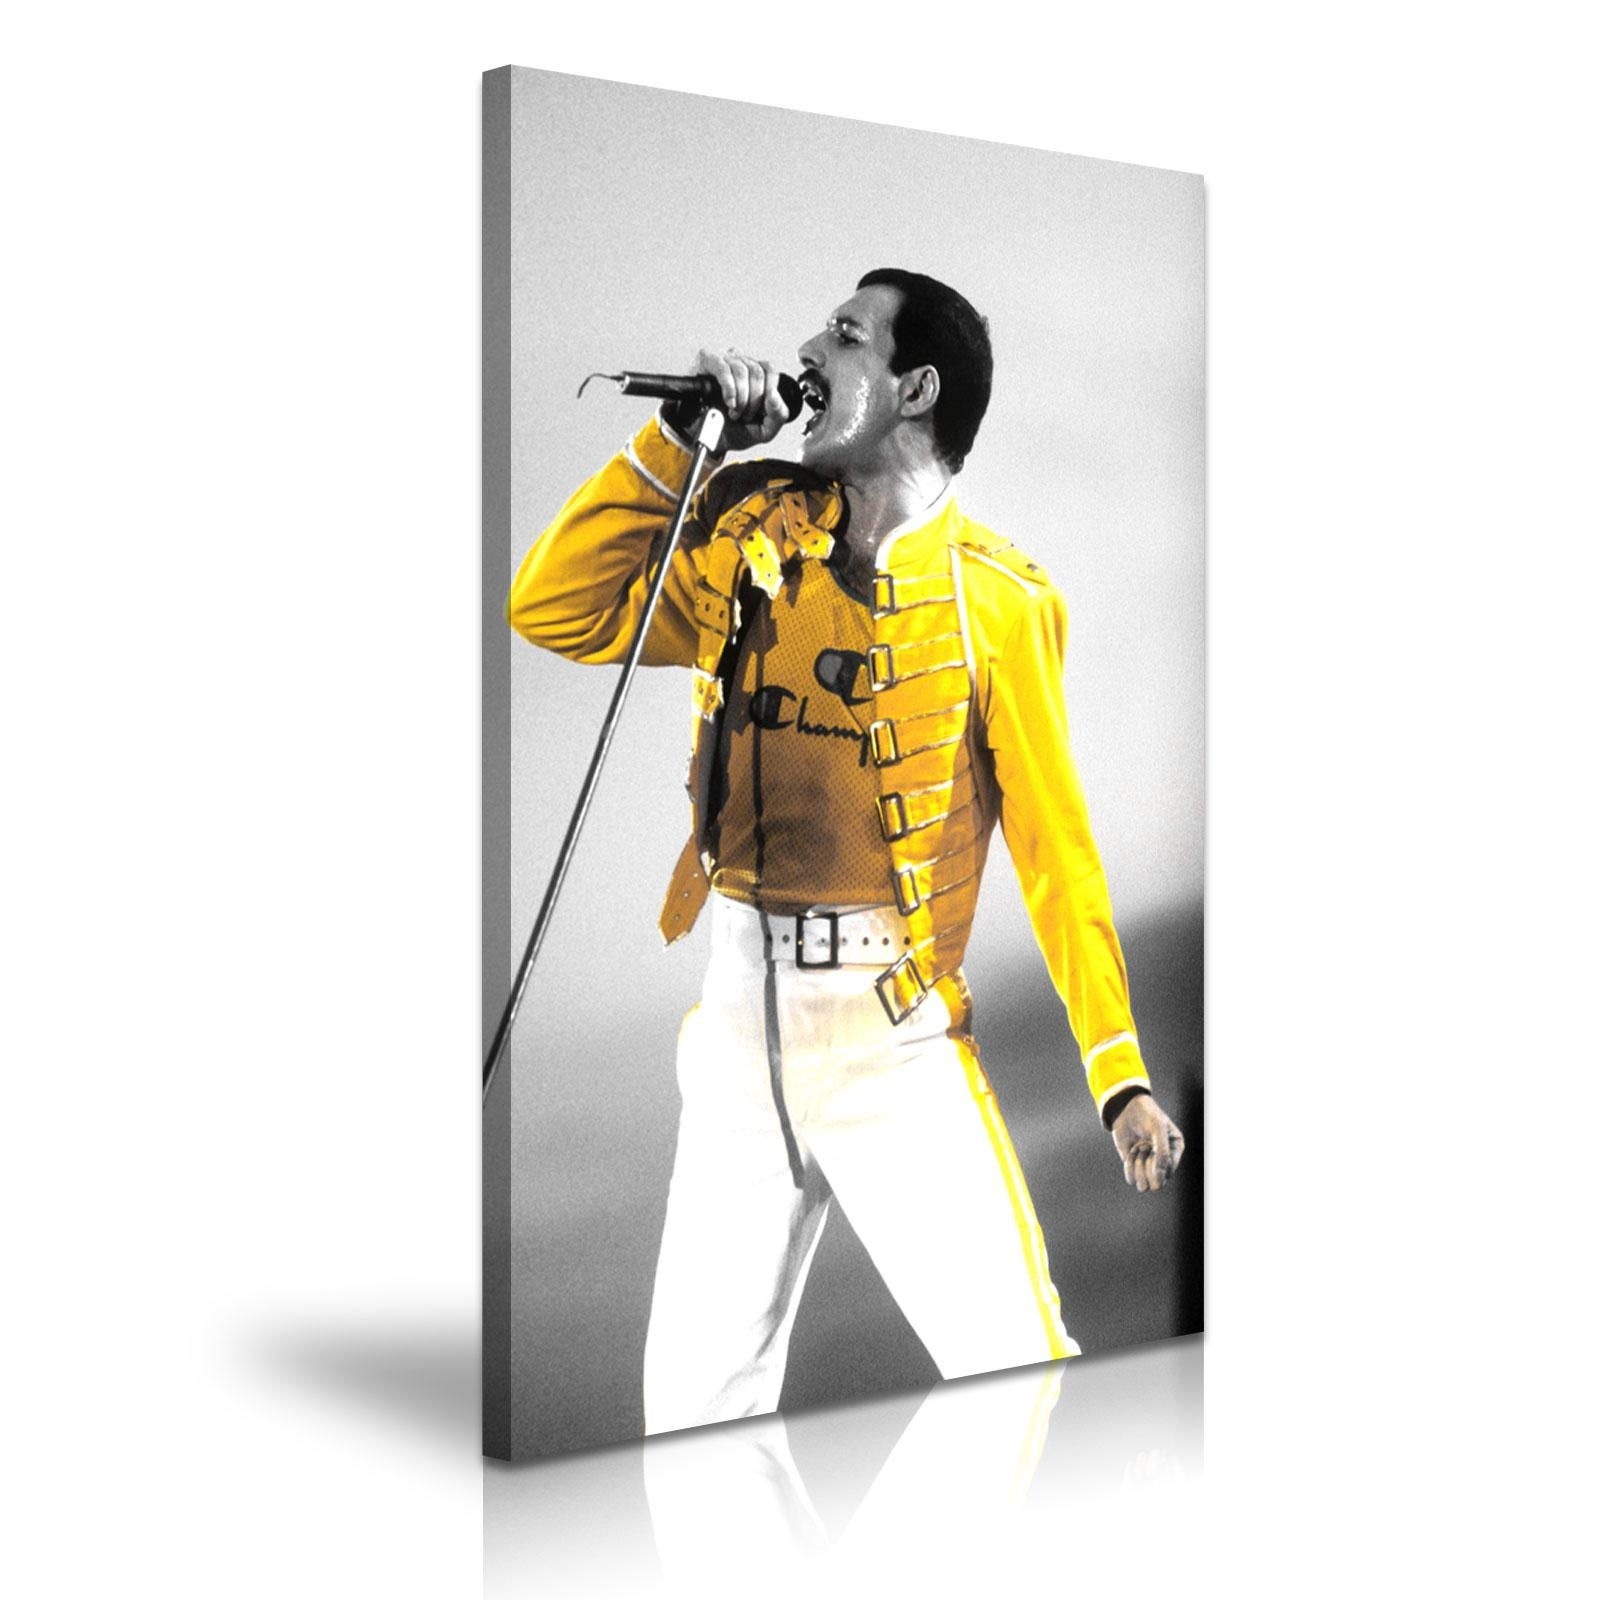 Music & Dance Freddie Mercury Queen Canvas Framed Print Wall Art With Regard To Freddie Mercury Wall Art (Image 13 of 20)